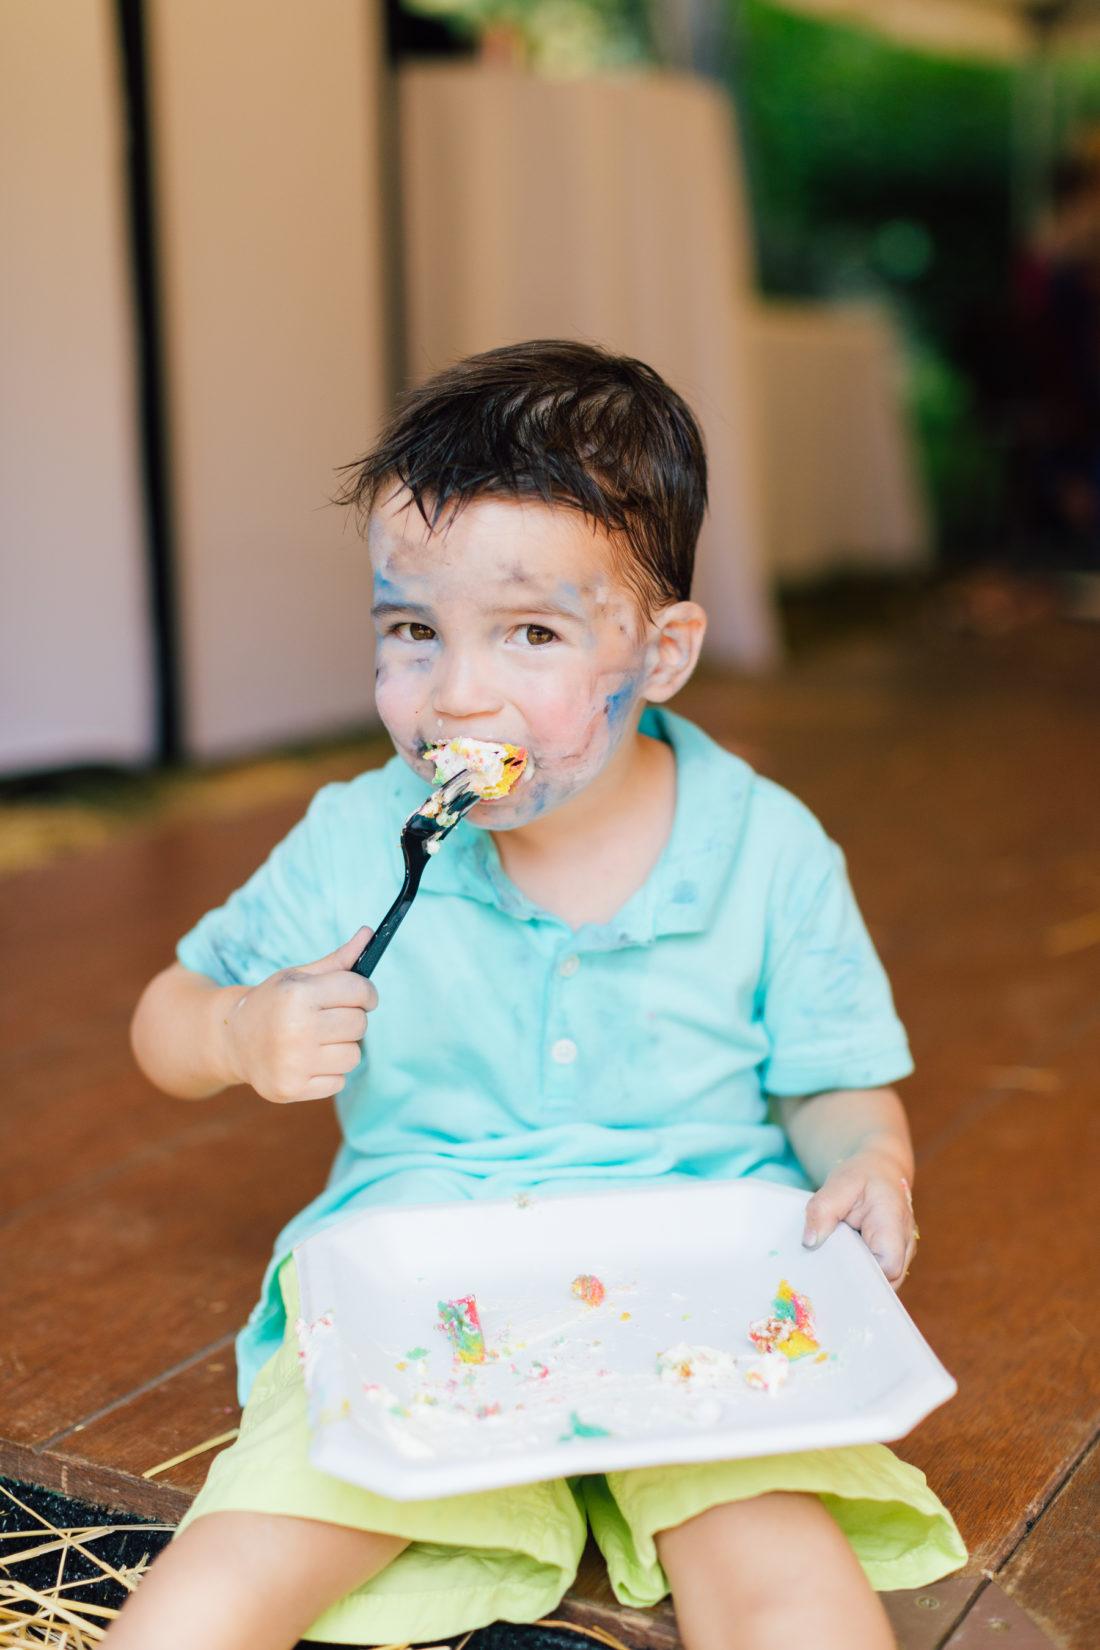 Major Martino enjoys birthday cake at his sister Marlowe's Cinco de Marlowe themed 5th birthday fiesta